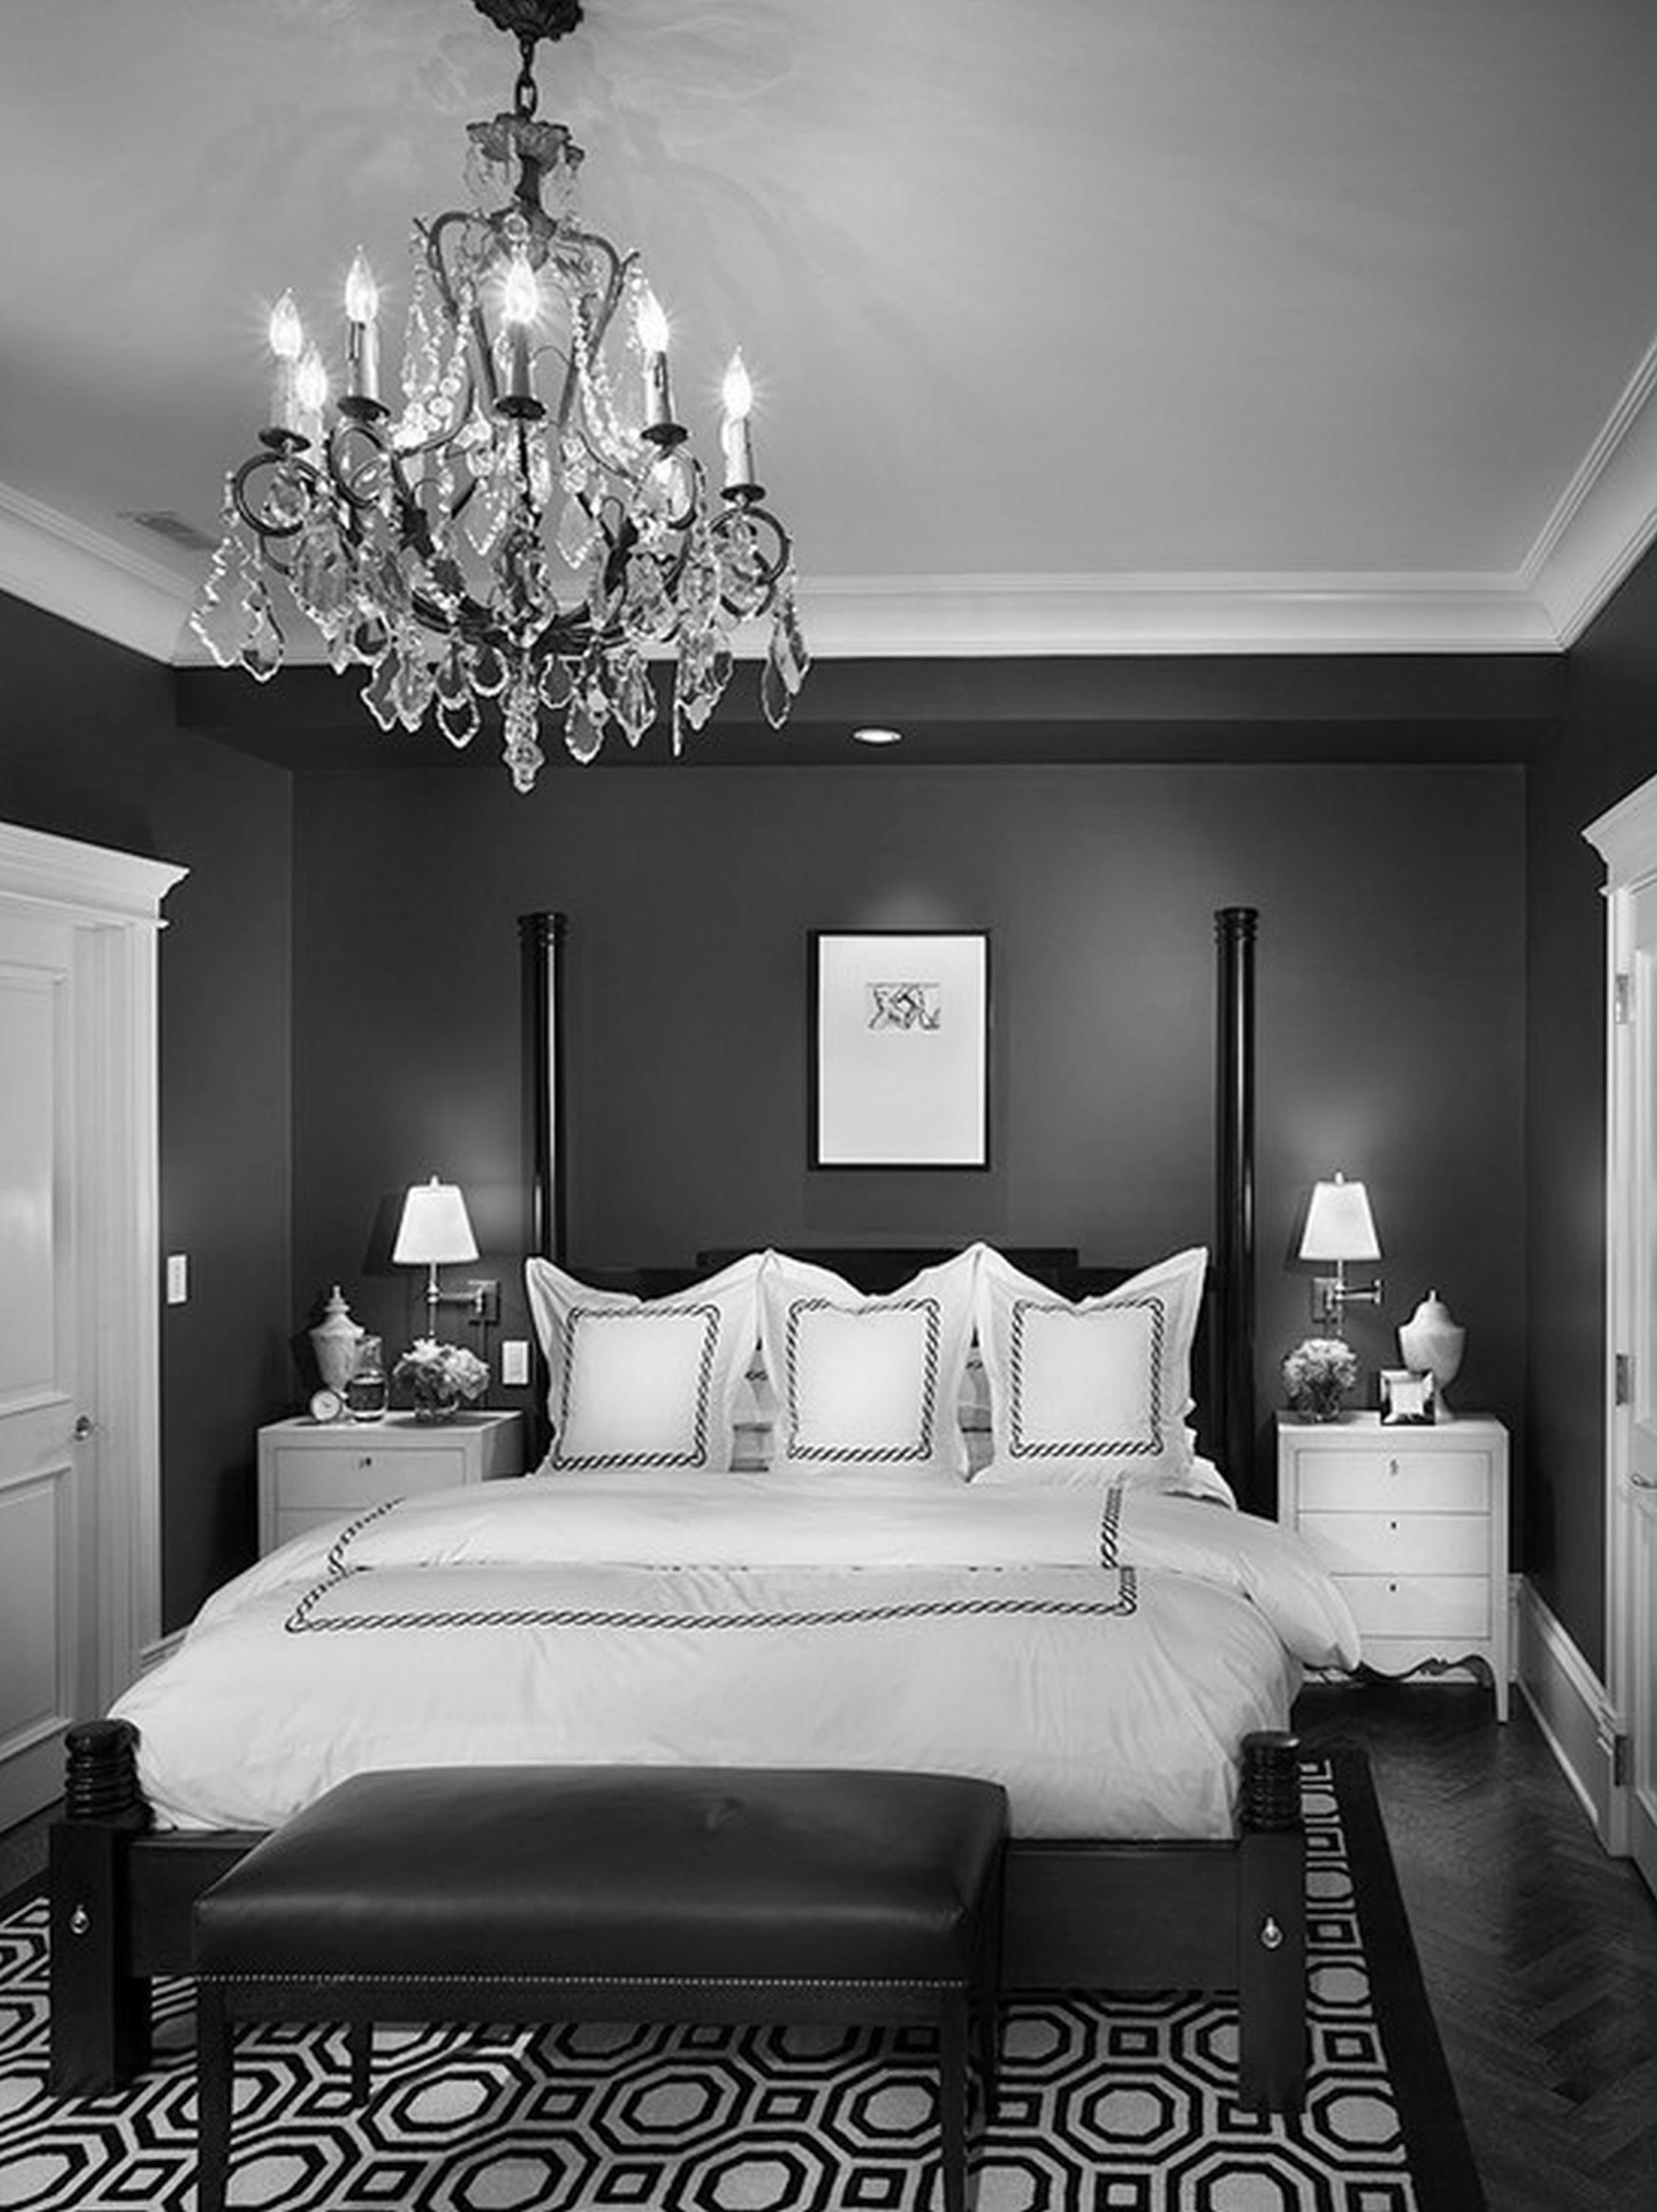 Latest Chandeliers : Black Chandelier For Bedroom Best Of Mini Chandeliers Throughout Black Chandelier Bedroom (View 12 of 15)